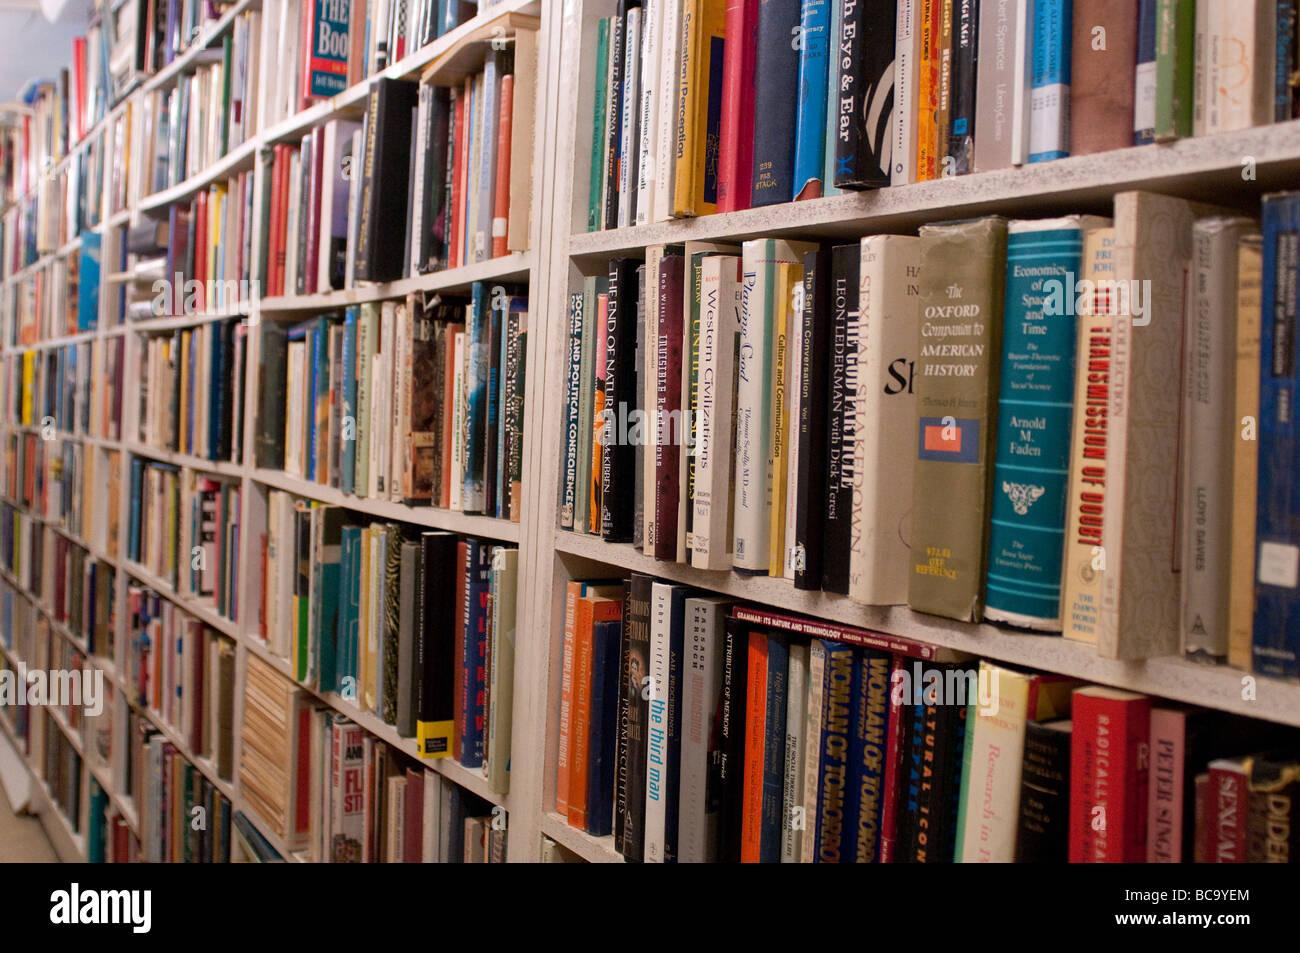 Books in Gould's secondhand bookshop on King Street, Newtown, Sydney, NSW, Australia Stock Photo